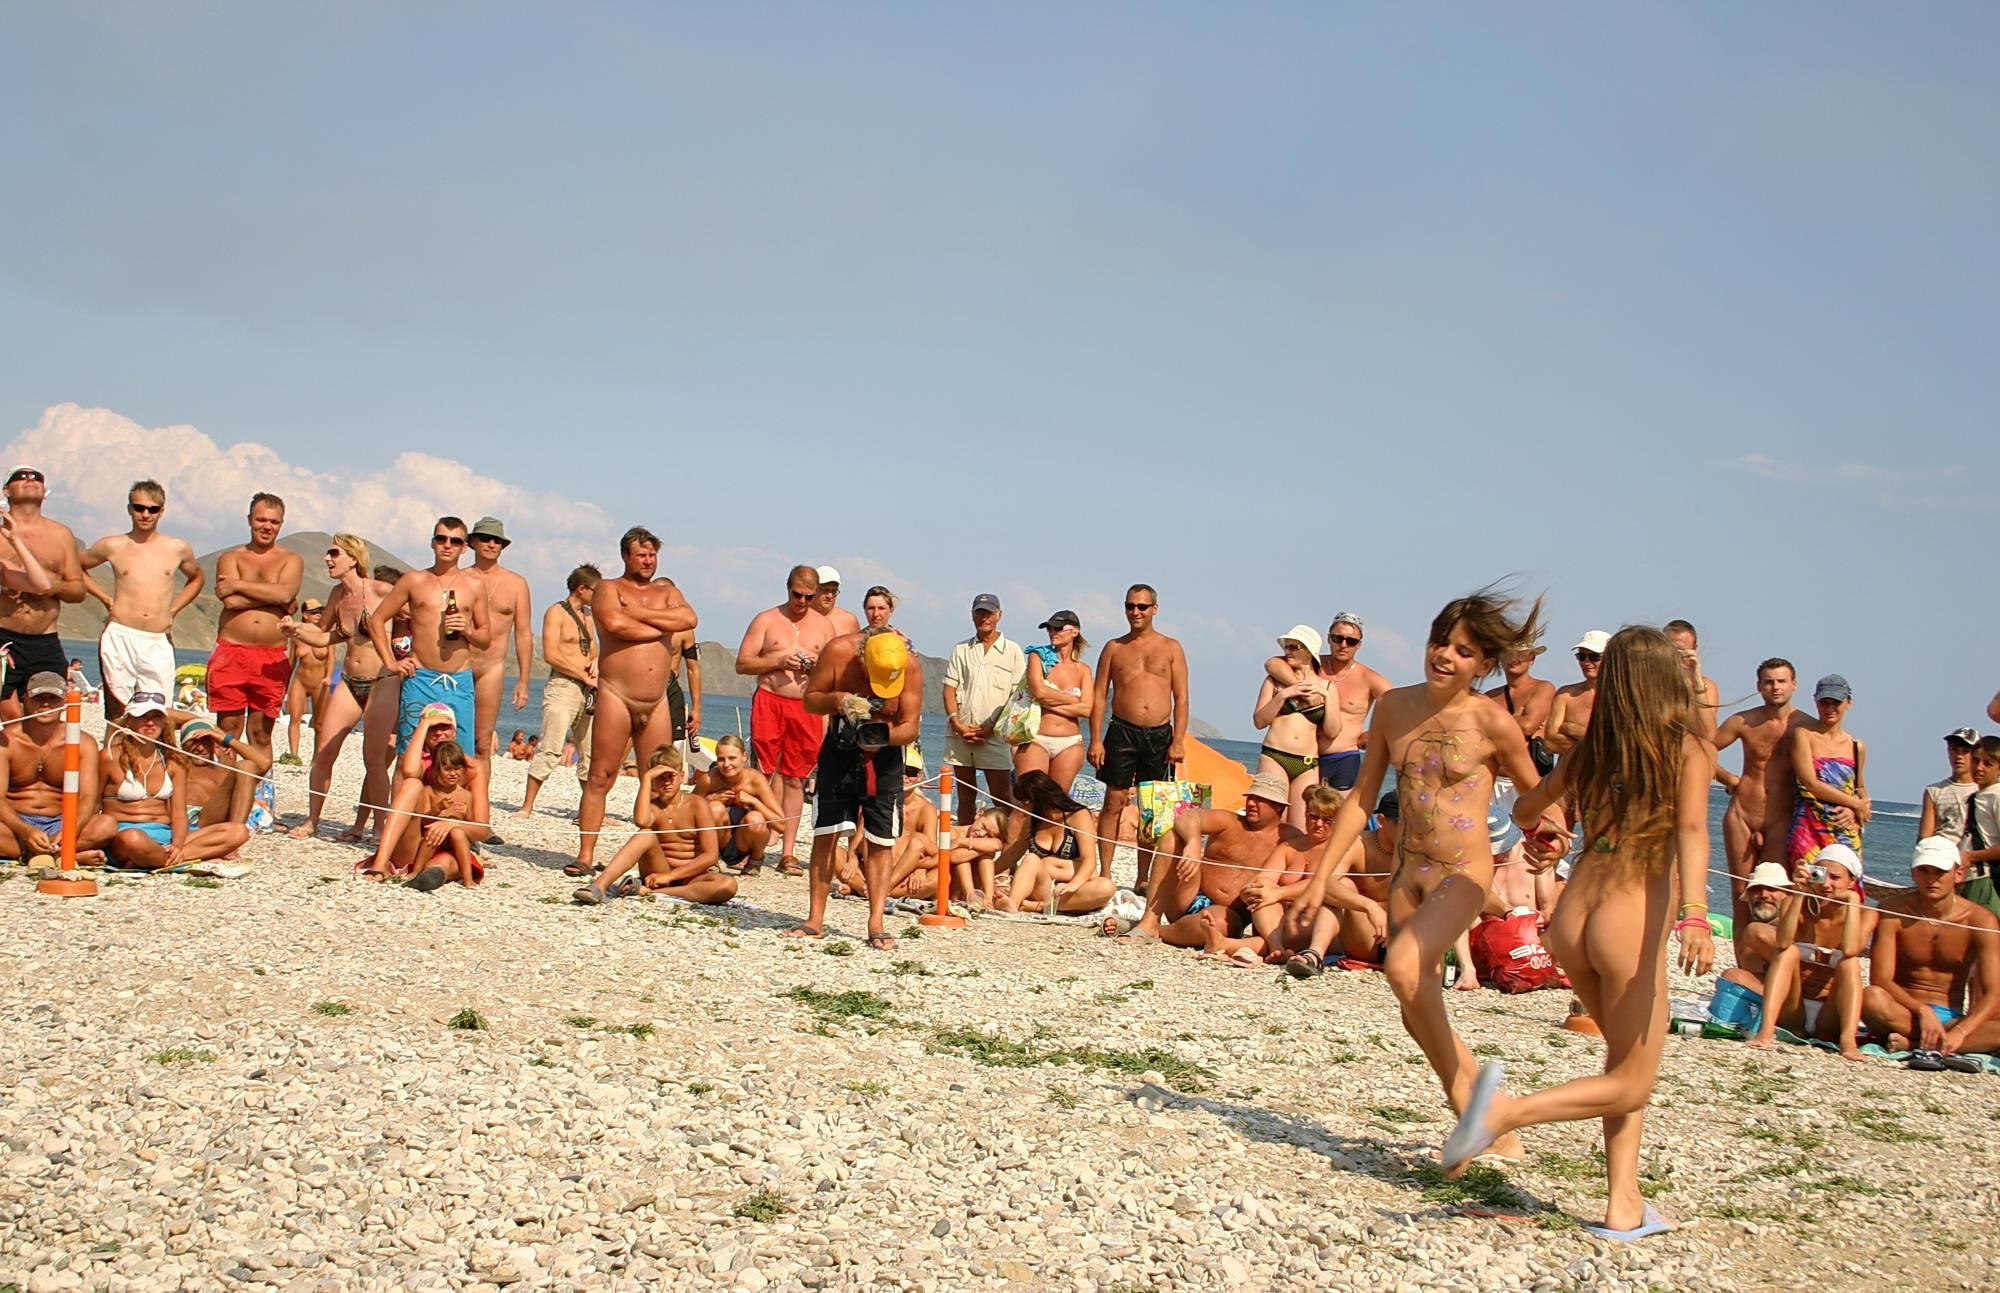 Nudist Pics The Heat Of The Dunes - 1